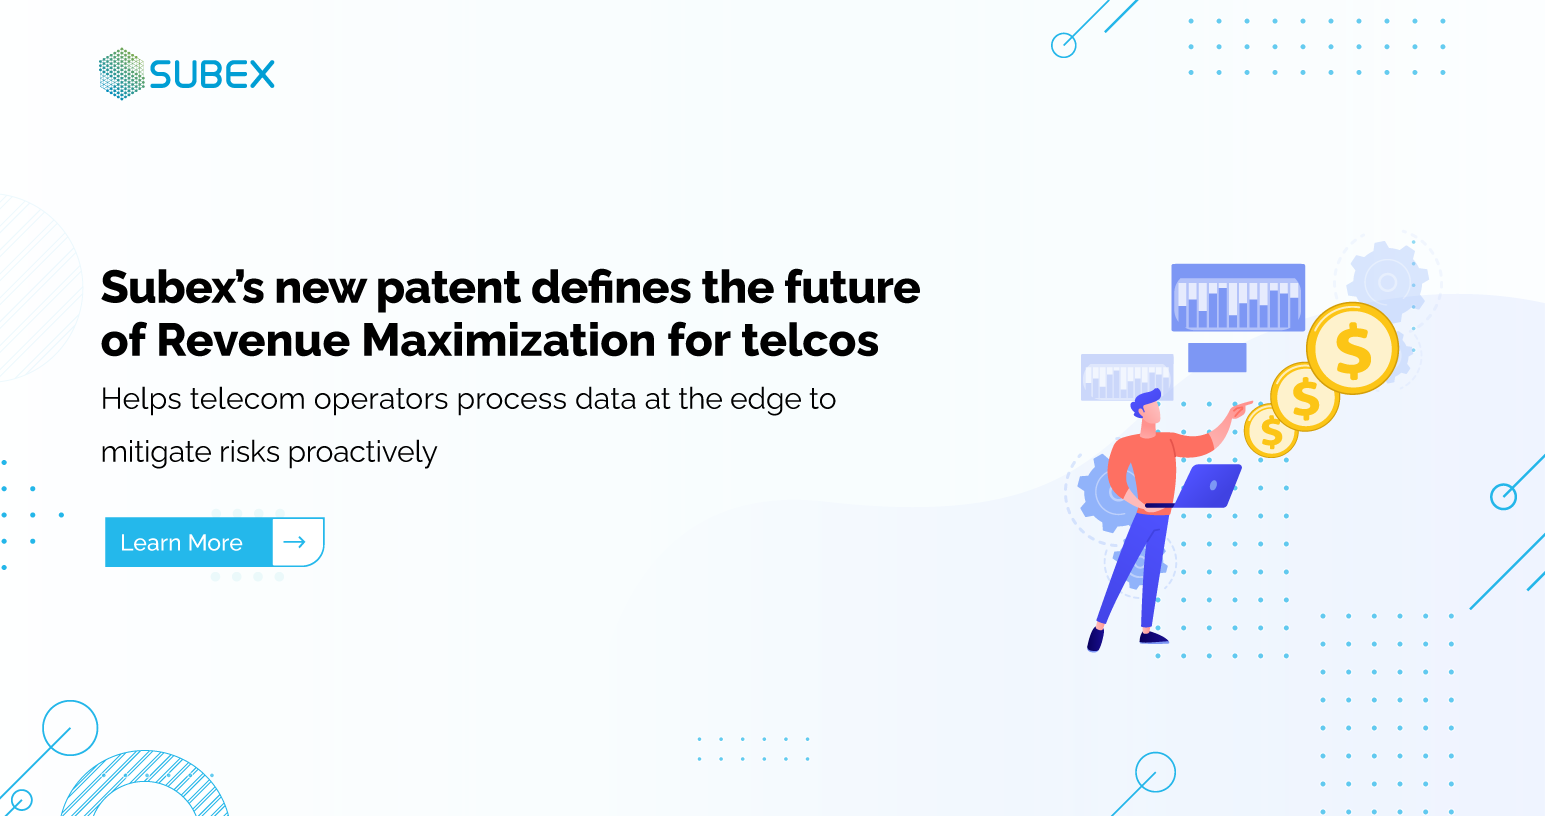 Subex's new patent defines the future of Revenue Maximization for telcos